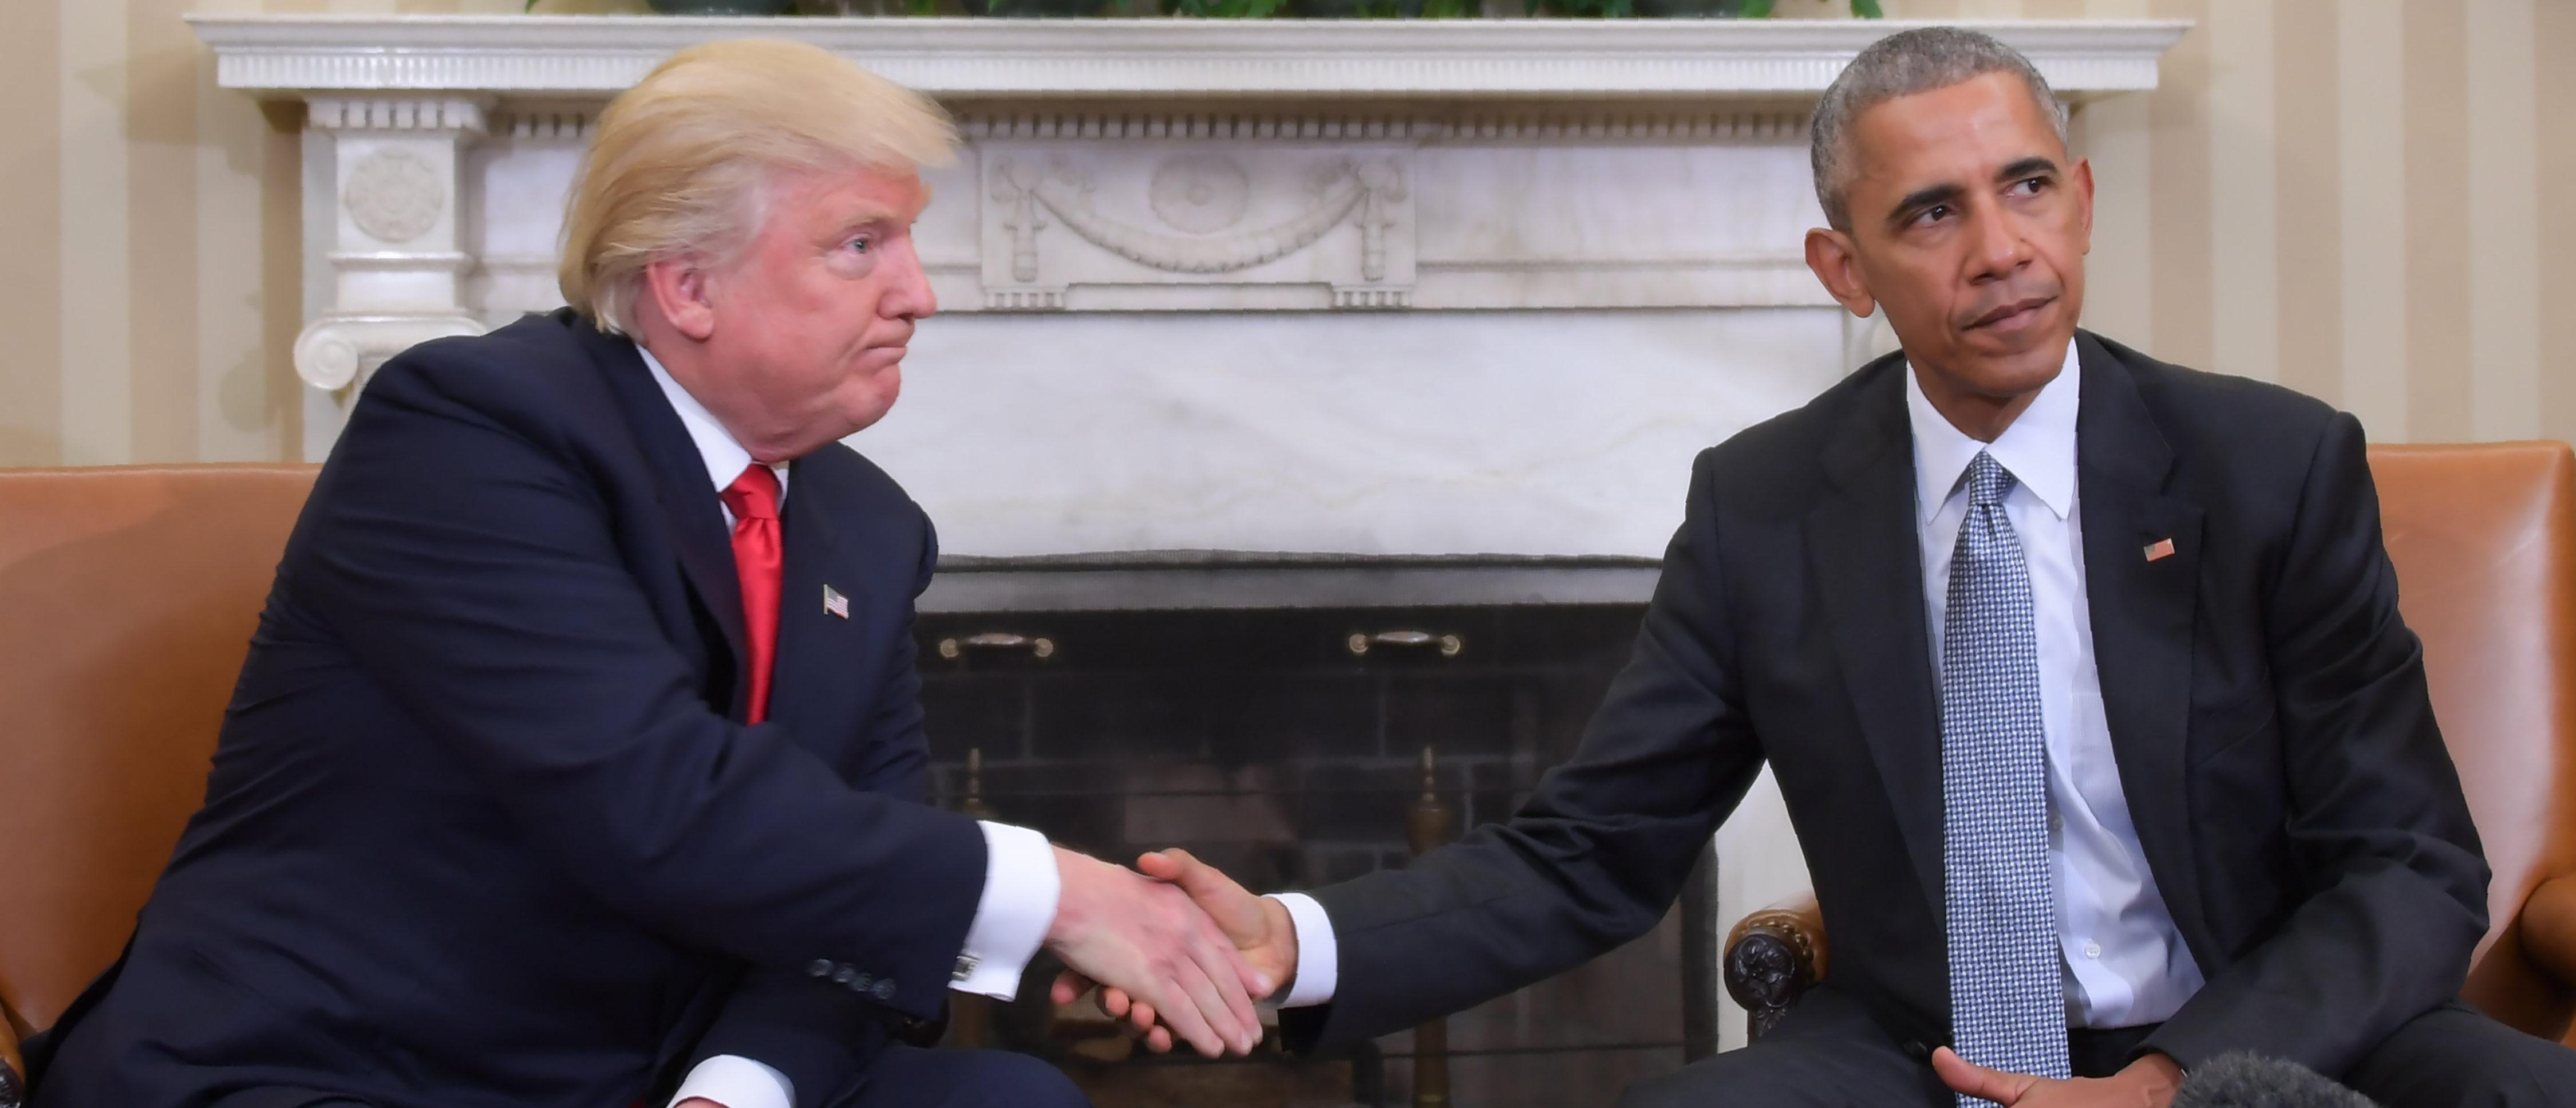 Donald Trump, Barack Obama (JIM WATSON/AFP/Getty Images)